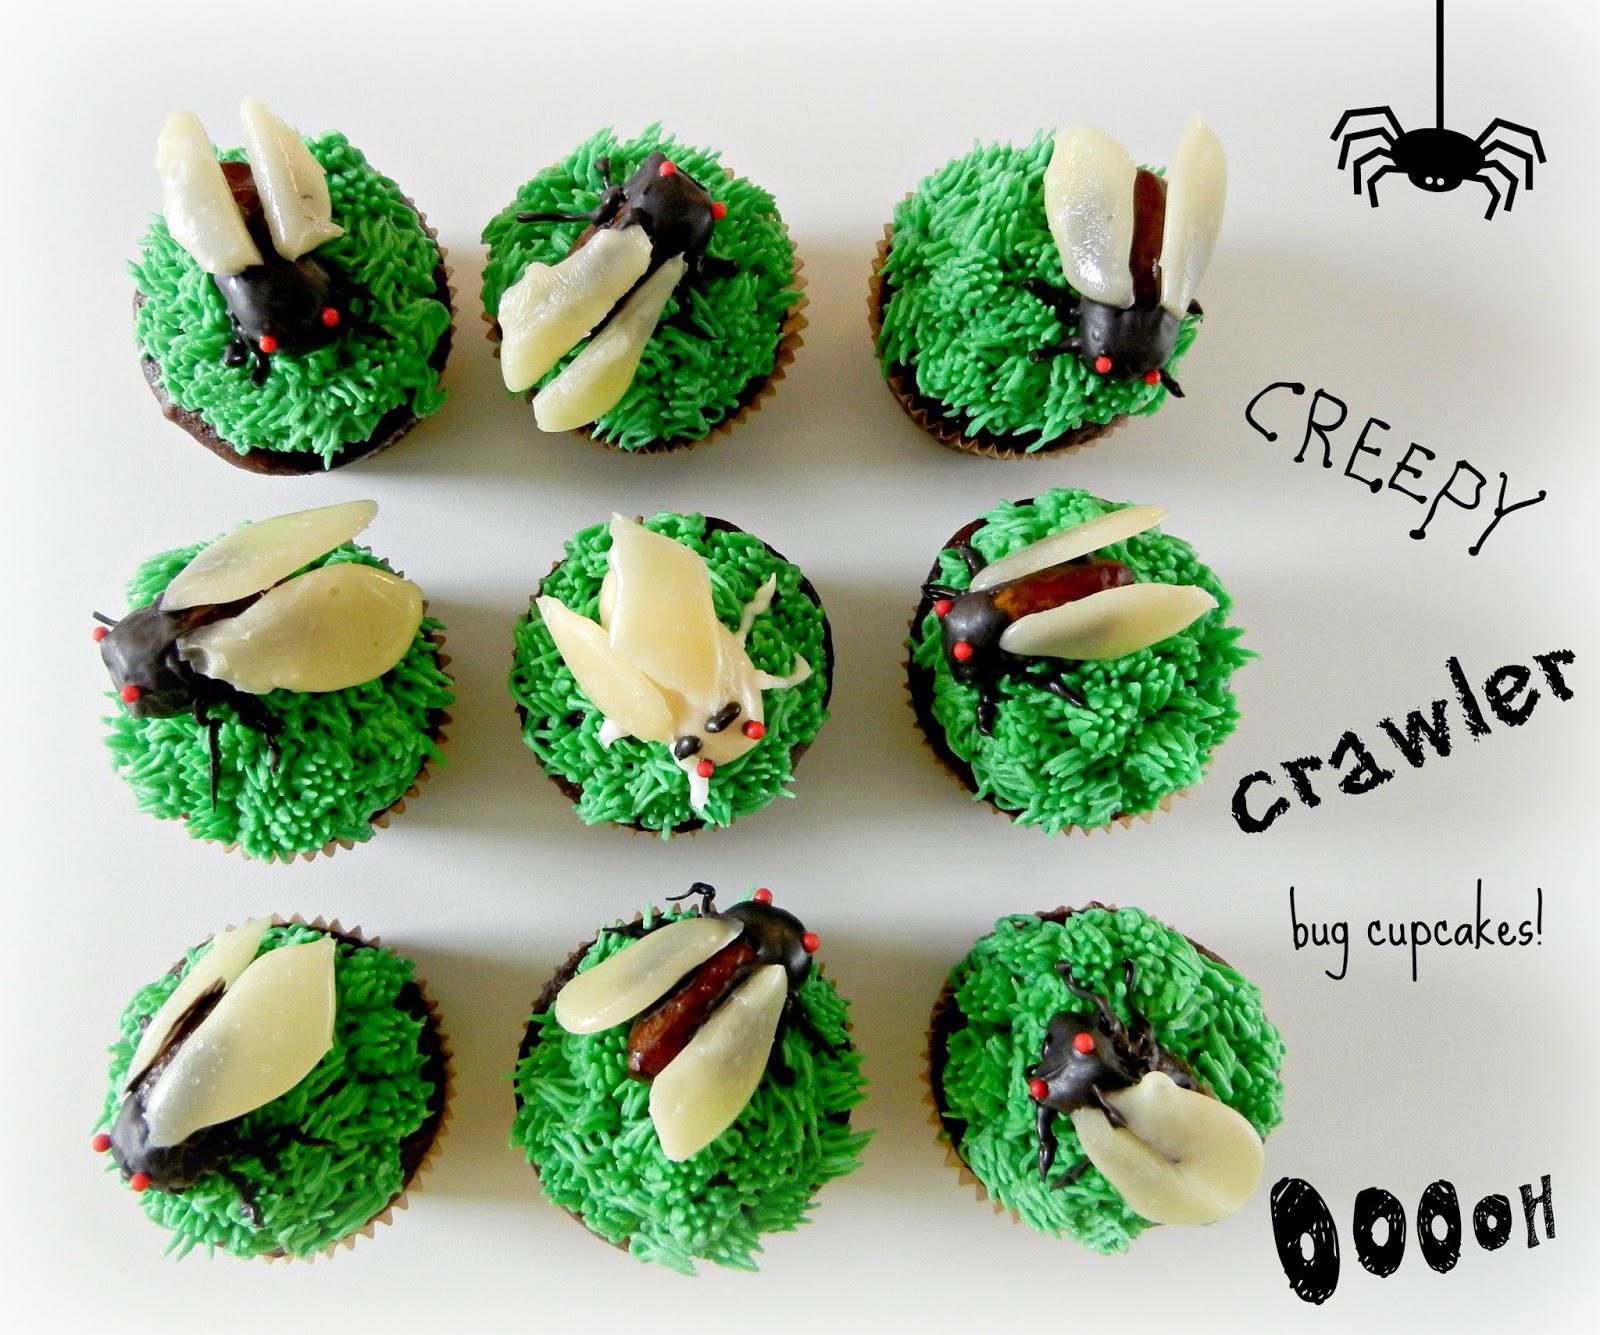 Sugar Swings Serve Some Cicada Bug Cupcakes - Bug cupcake decorating ideas